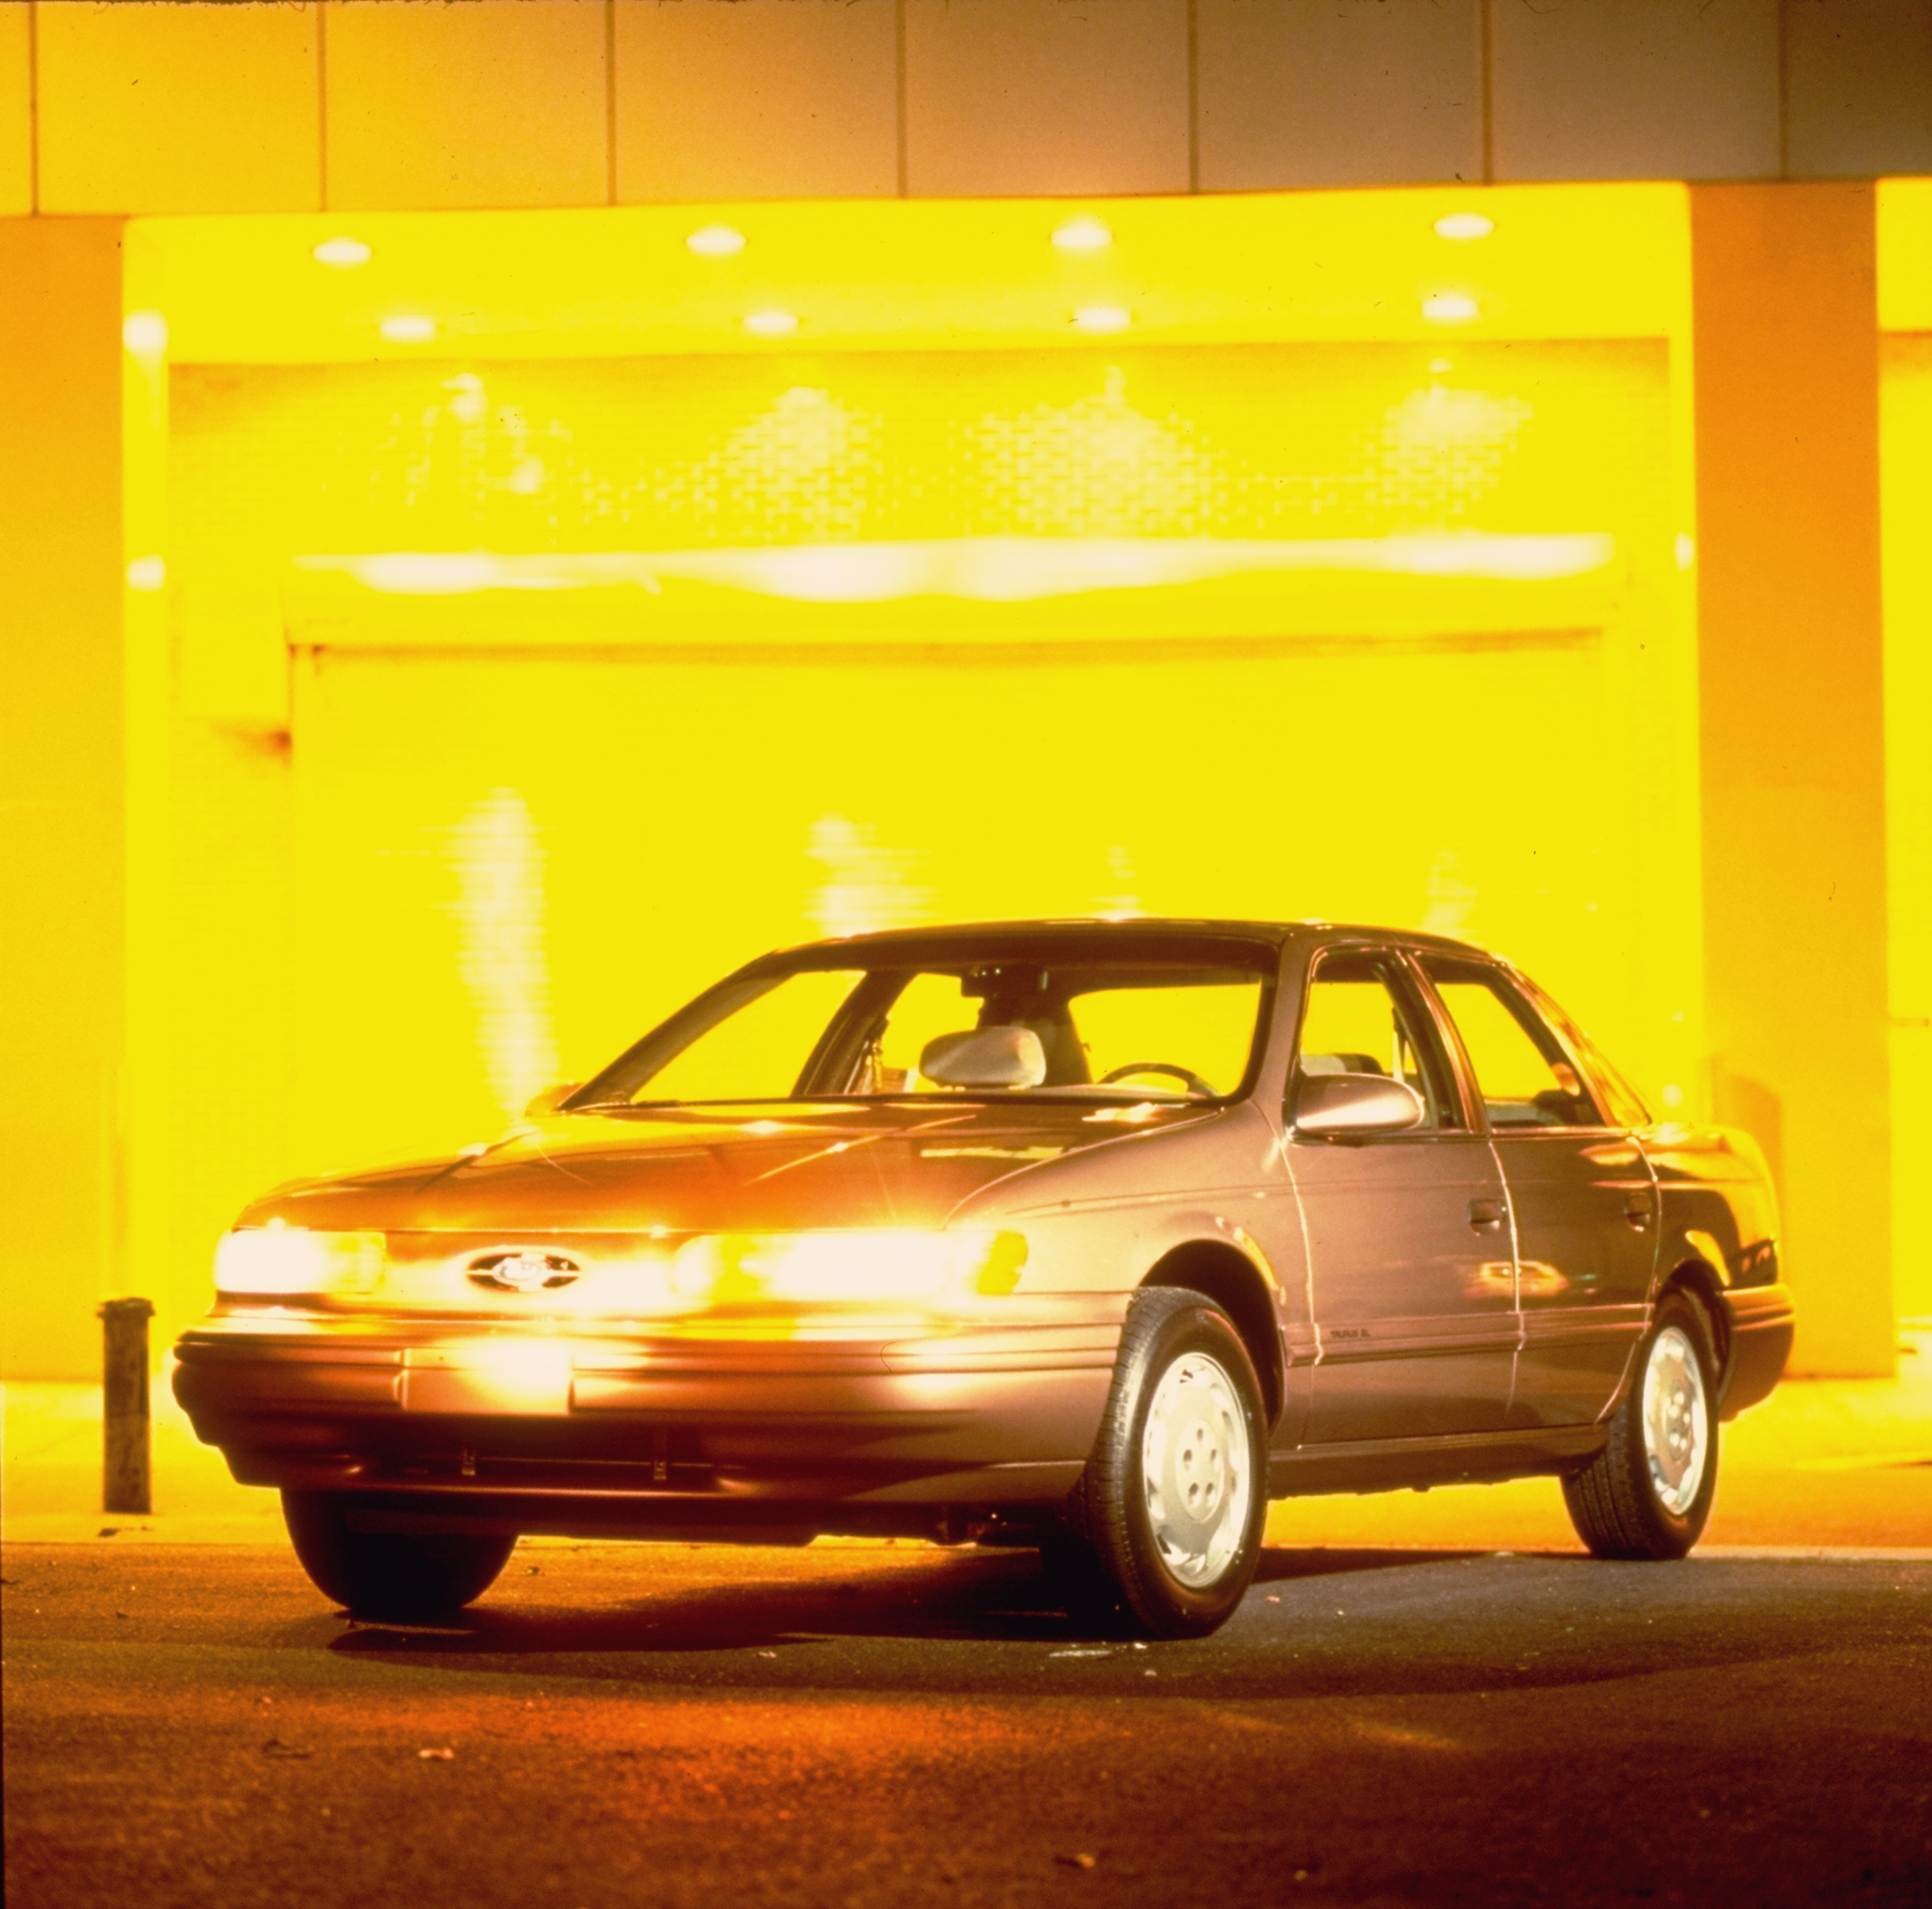 Silver 1992 Ford Taurus w. front headlig